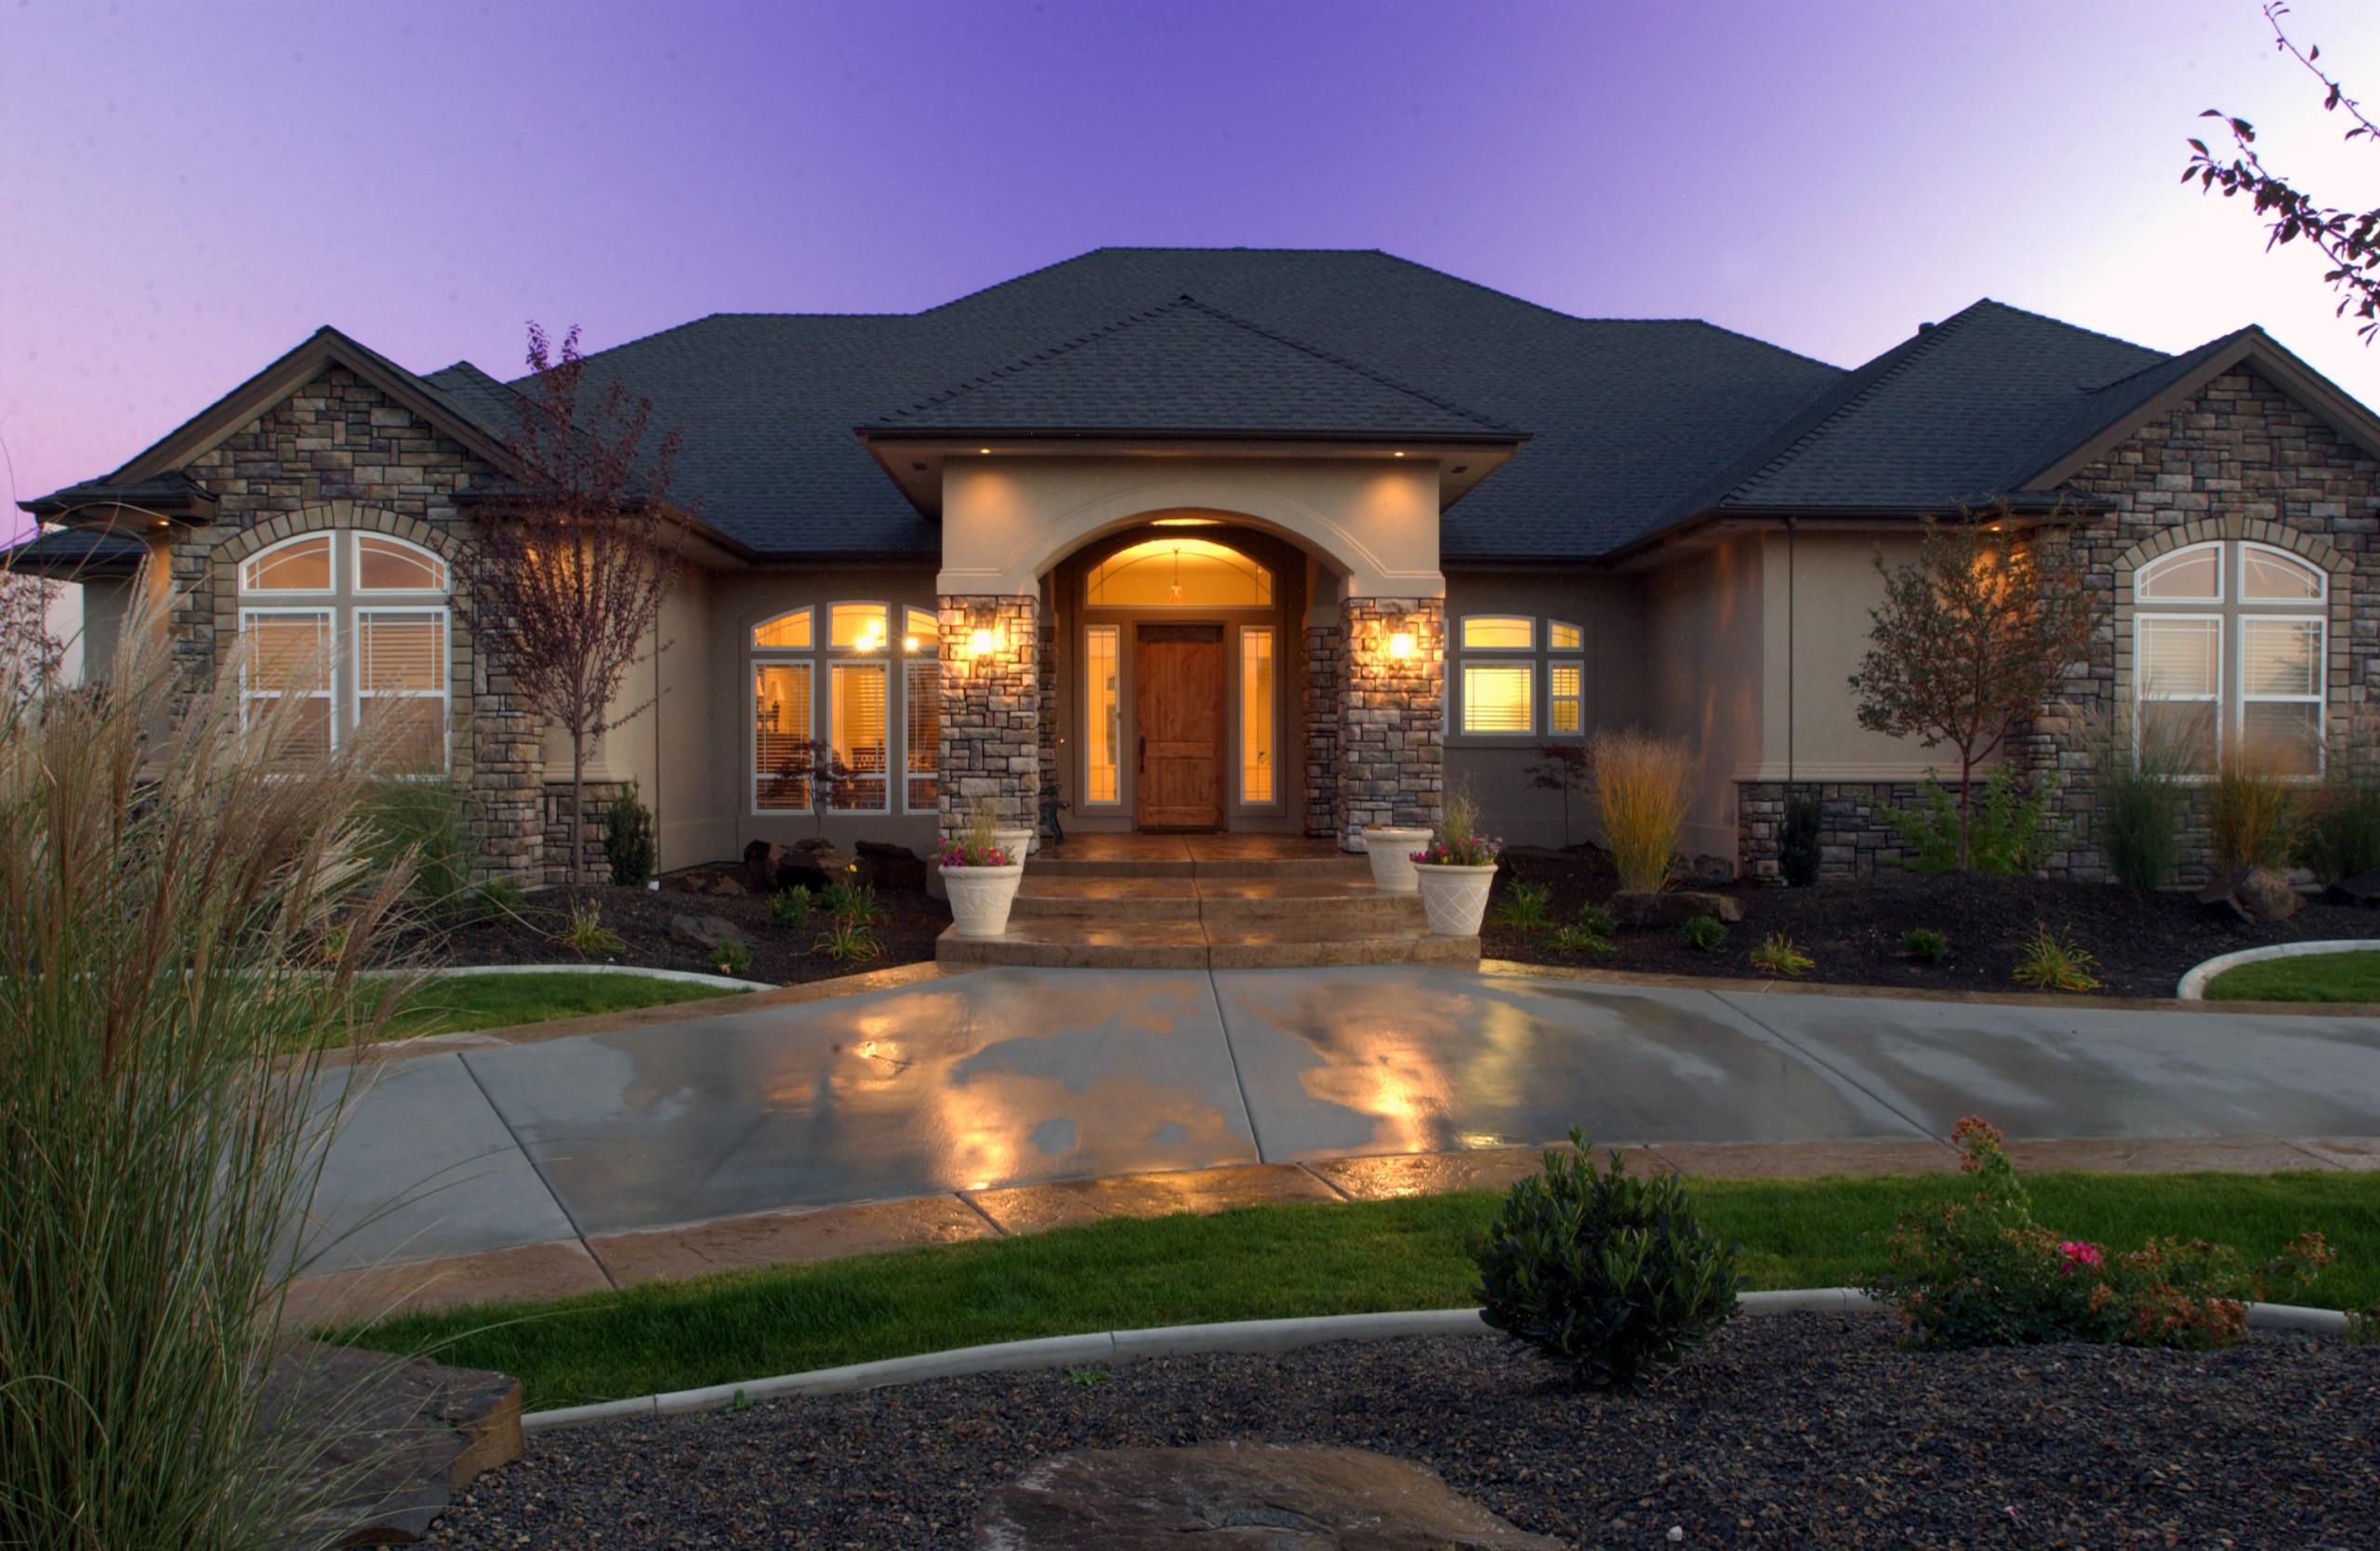 Interior and Exterior Luxury Lighting Home Design